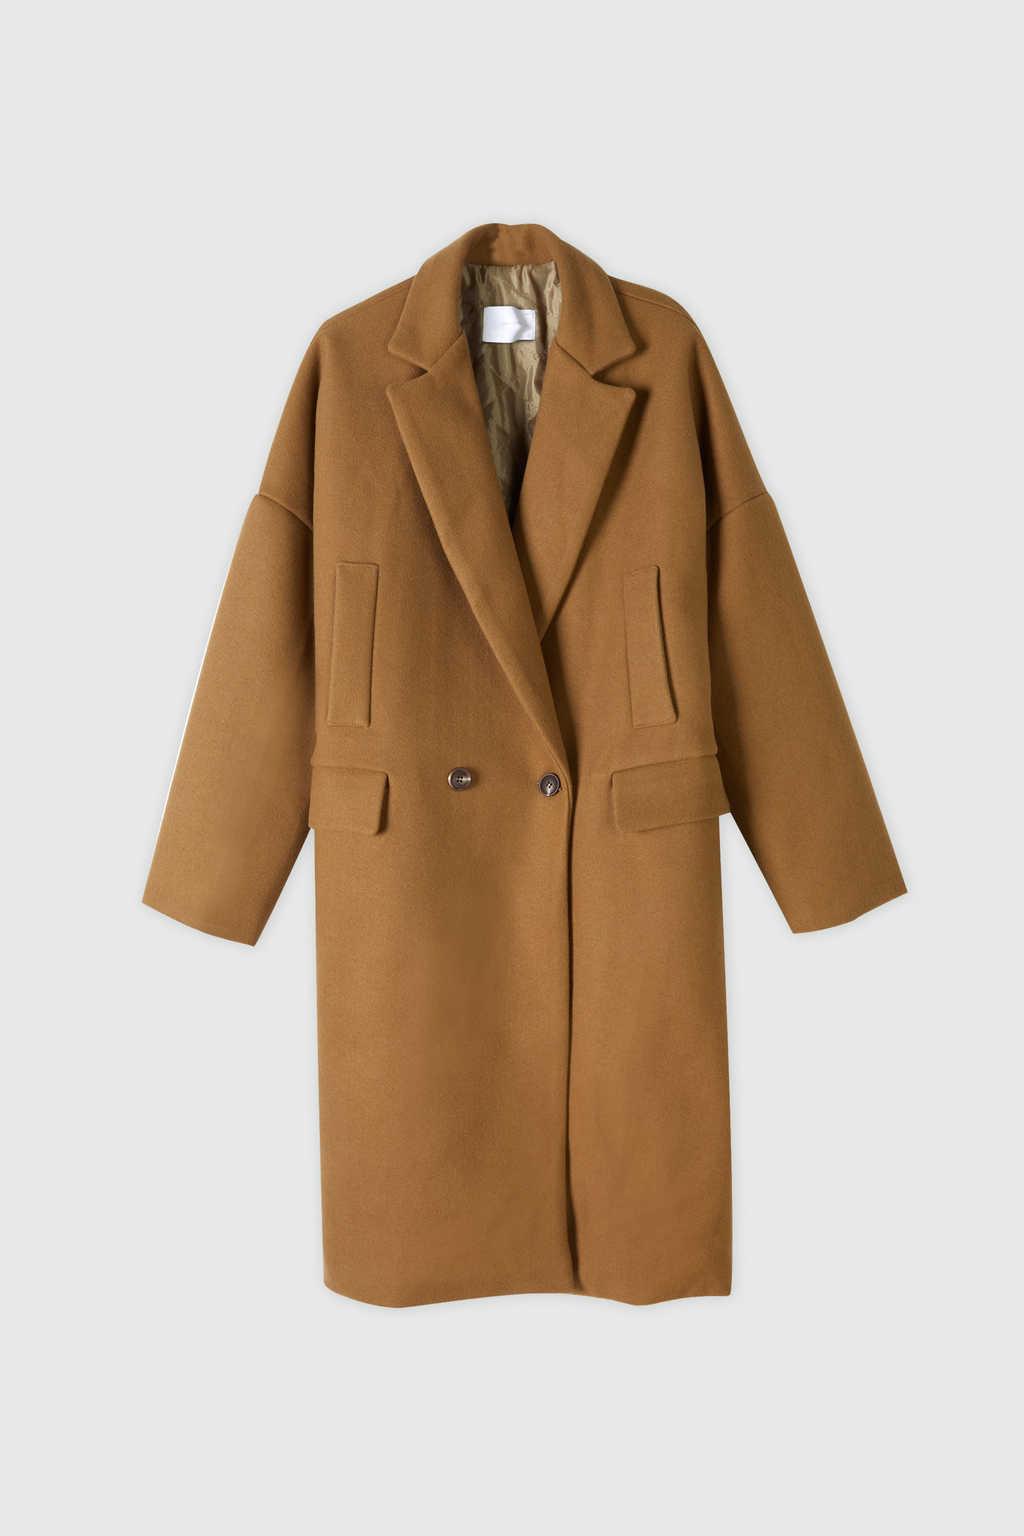 Coat J007 Mustard 13